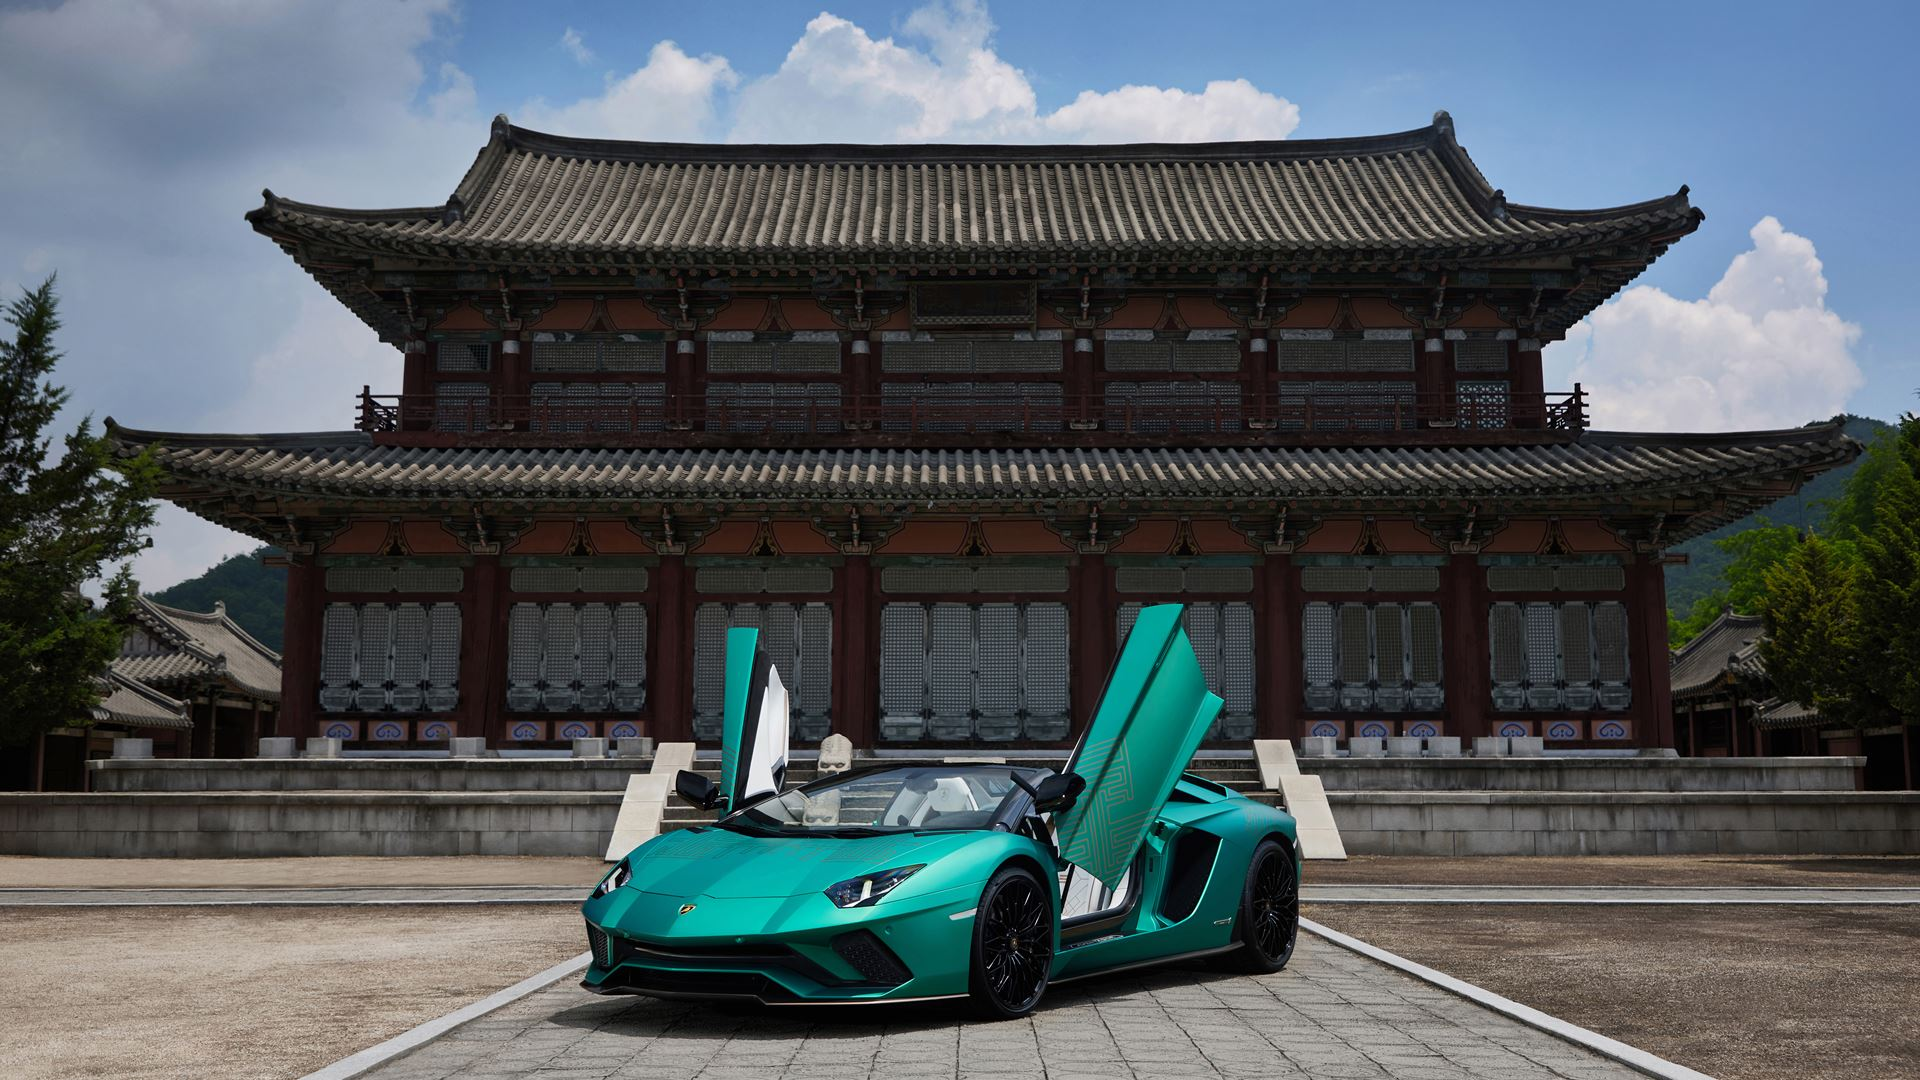 Lamborghini Seoul Unveils the Aventador S Roadster Korean Special Series - Image 7